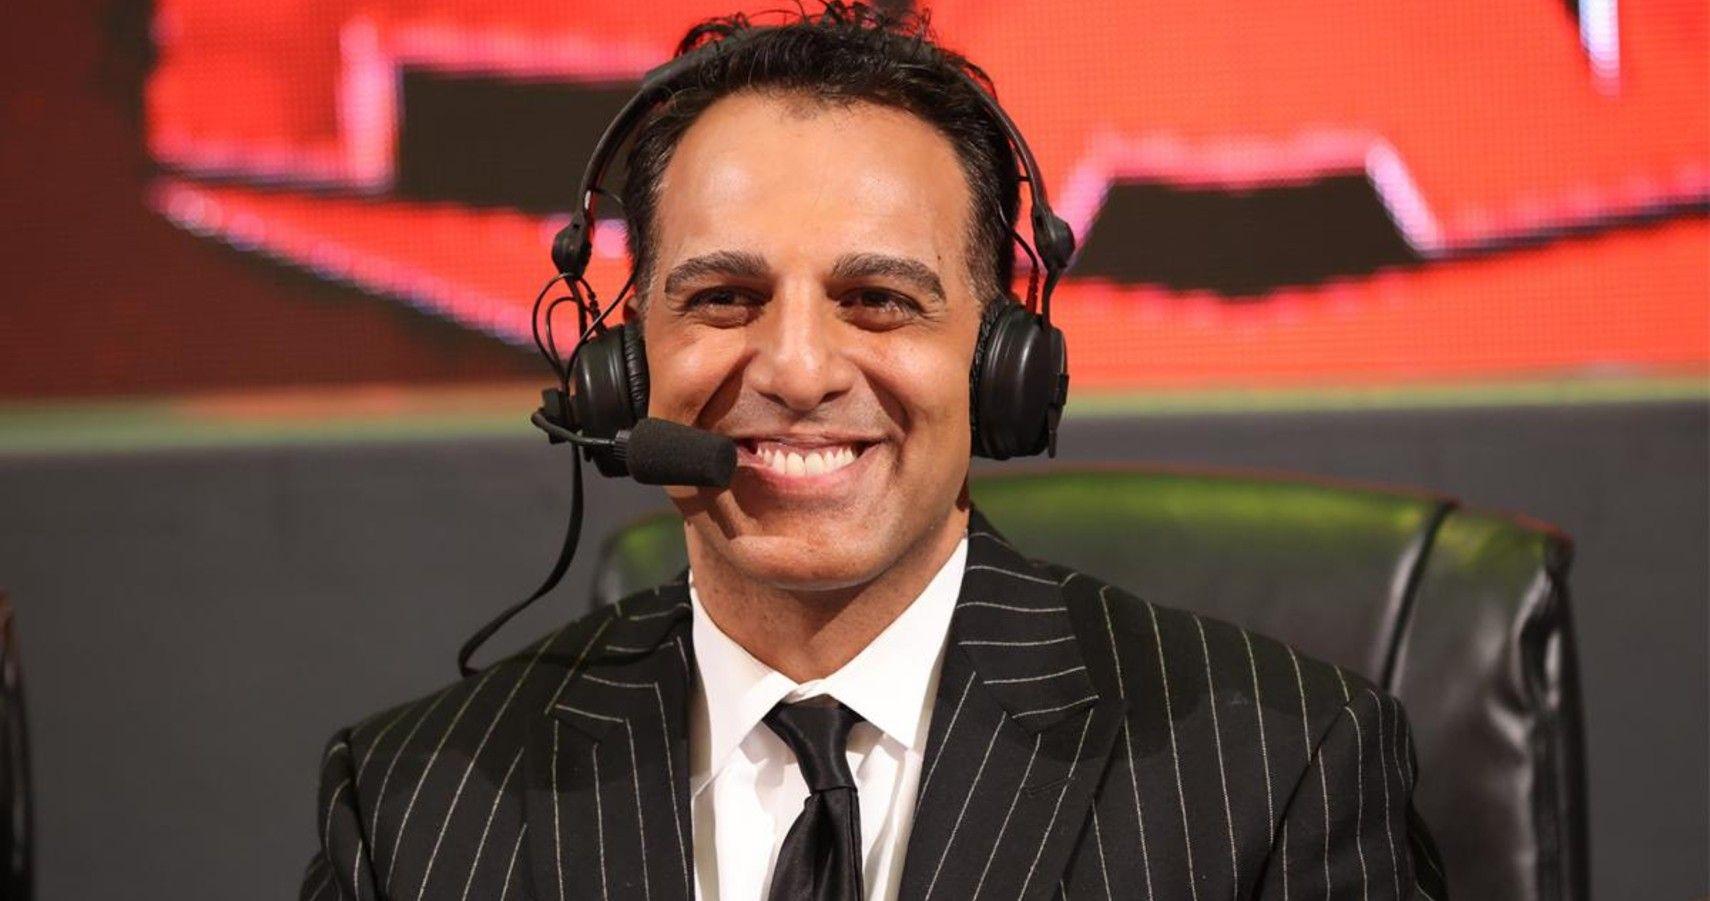 WWE Has Already Released New Raw Announcer Adnan Virk